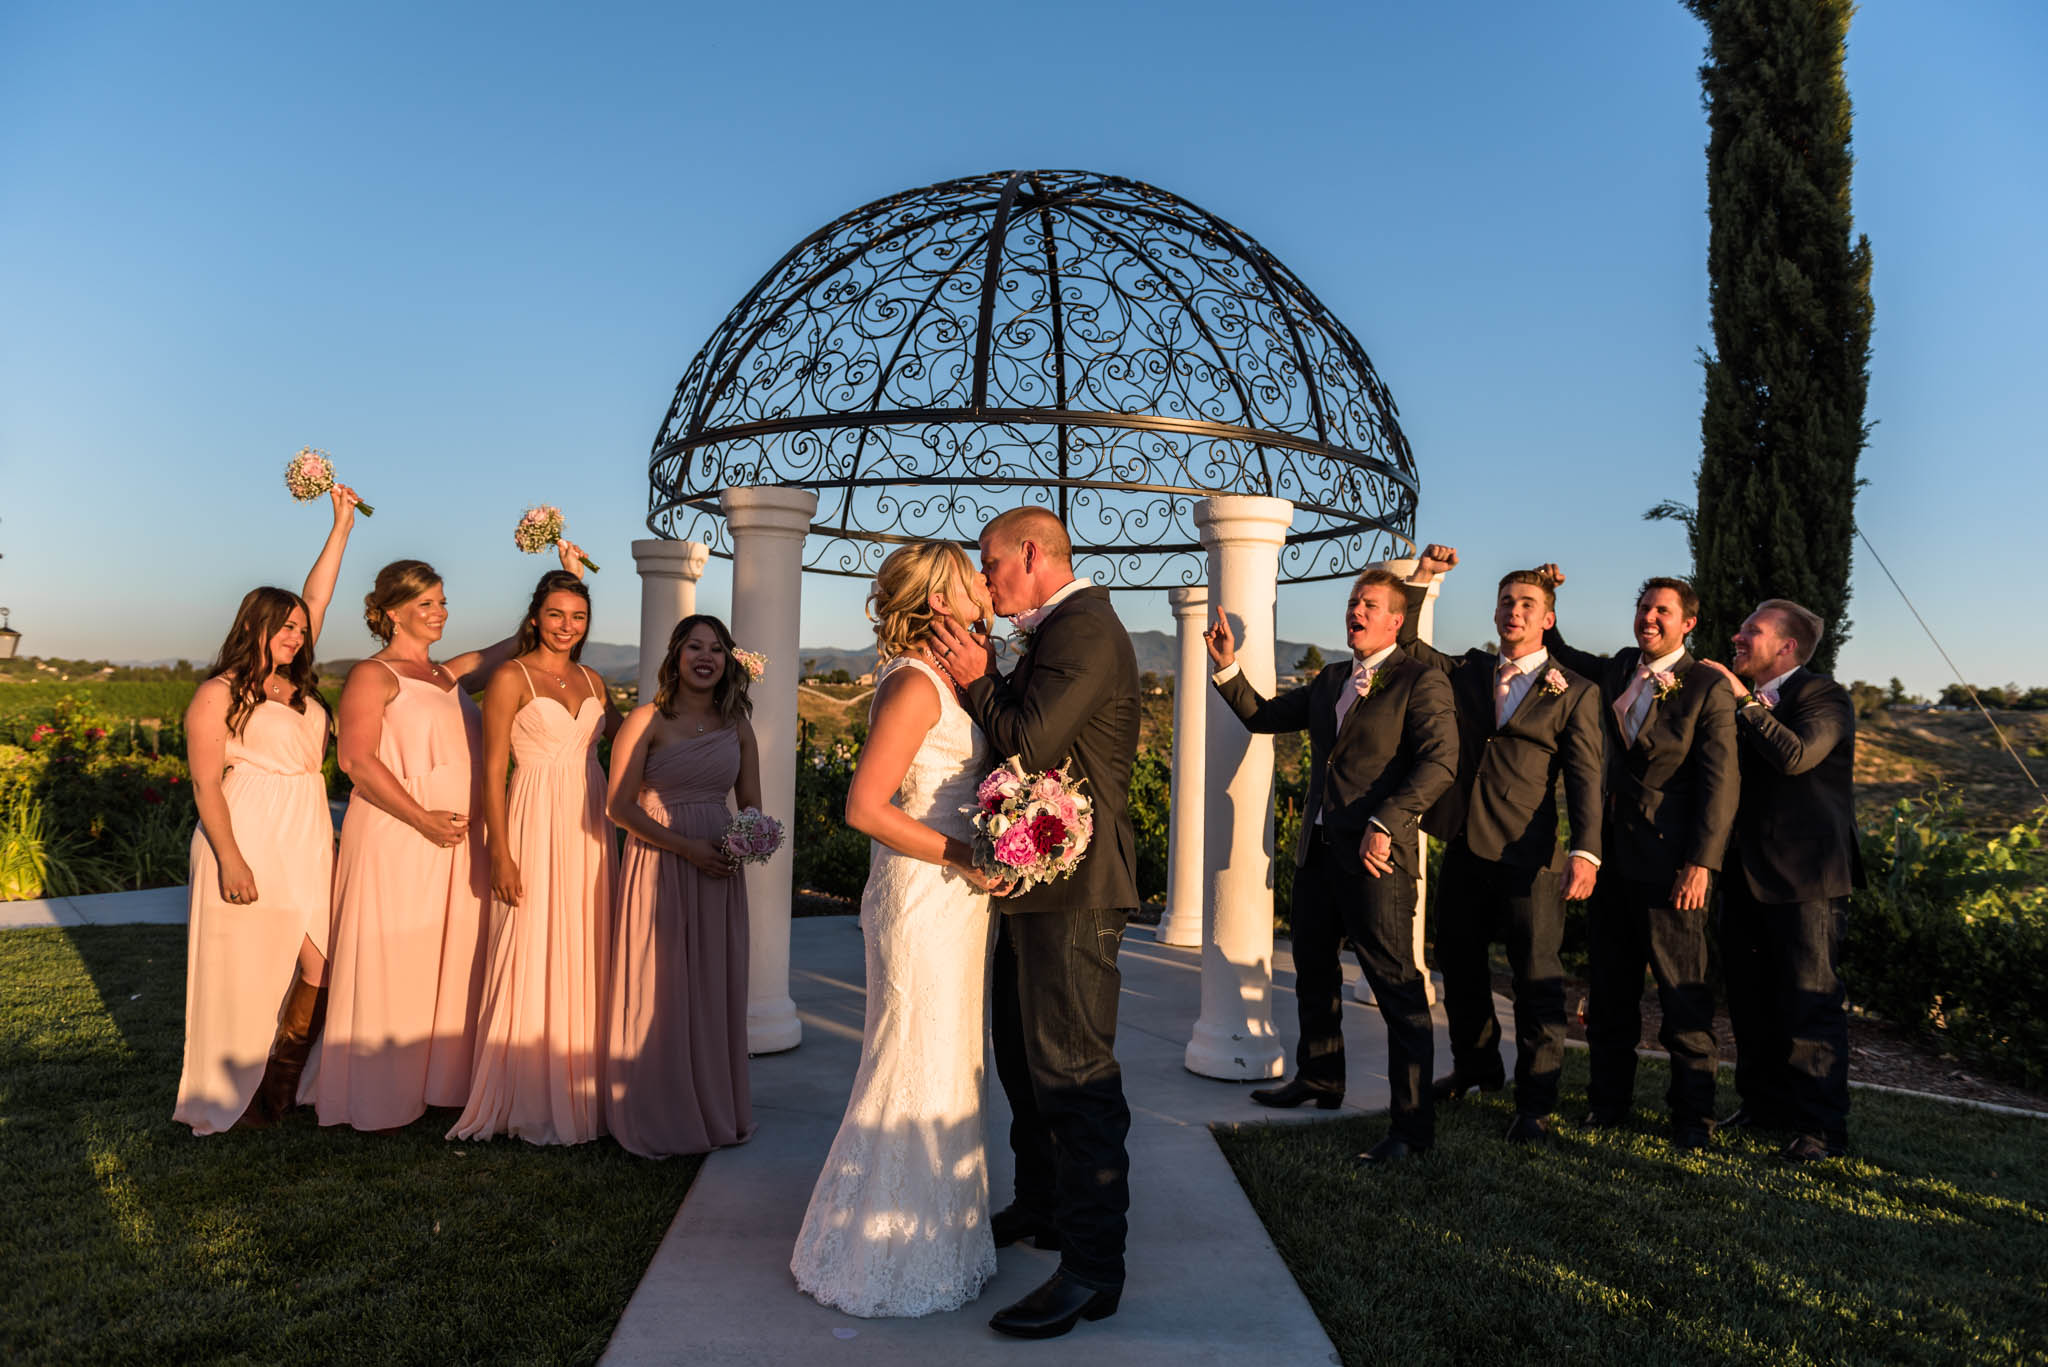 Avensole-Winery-Temecula-Wedding-Josh-and-Olivia-3747.JPG